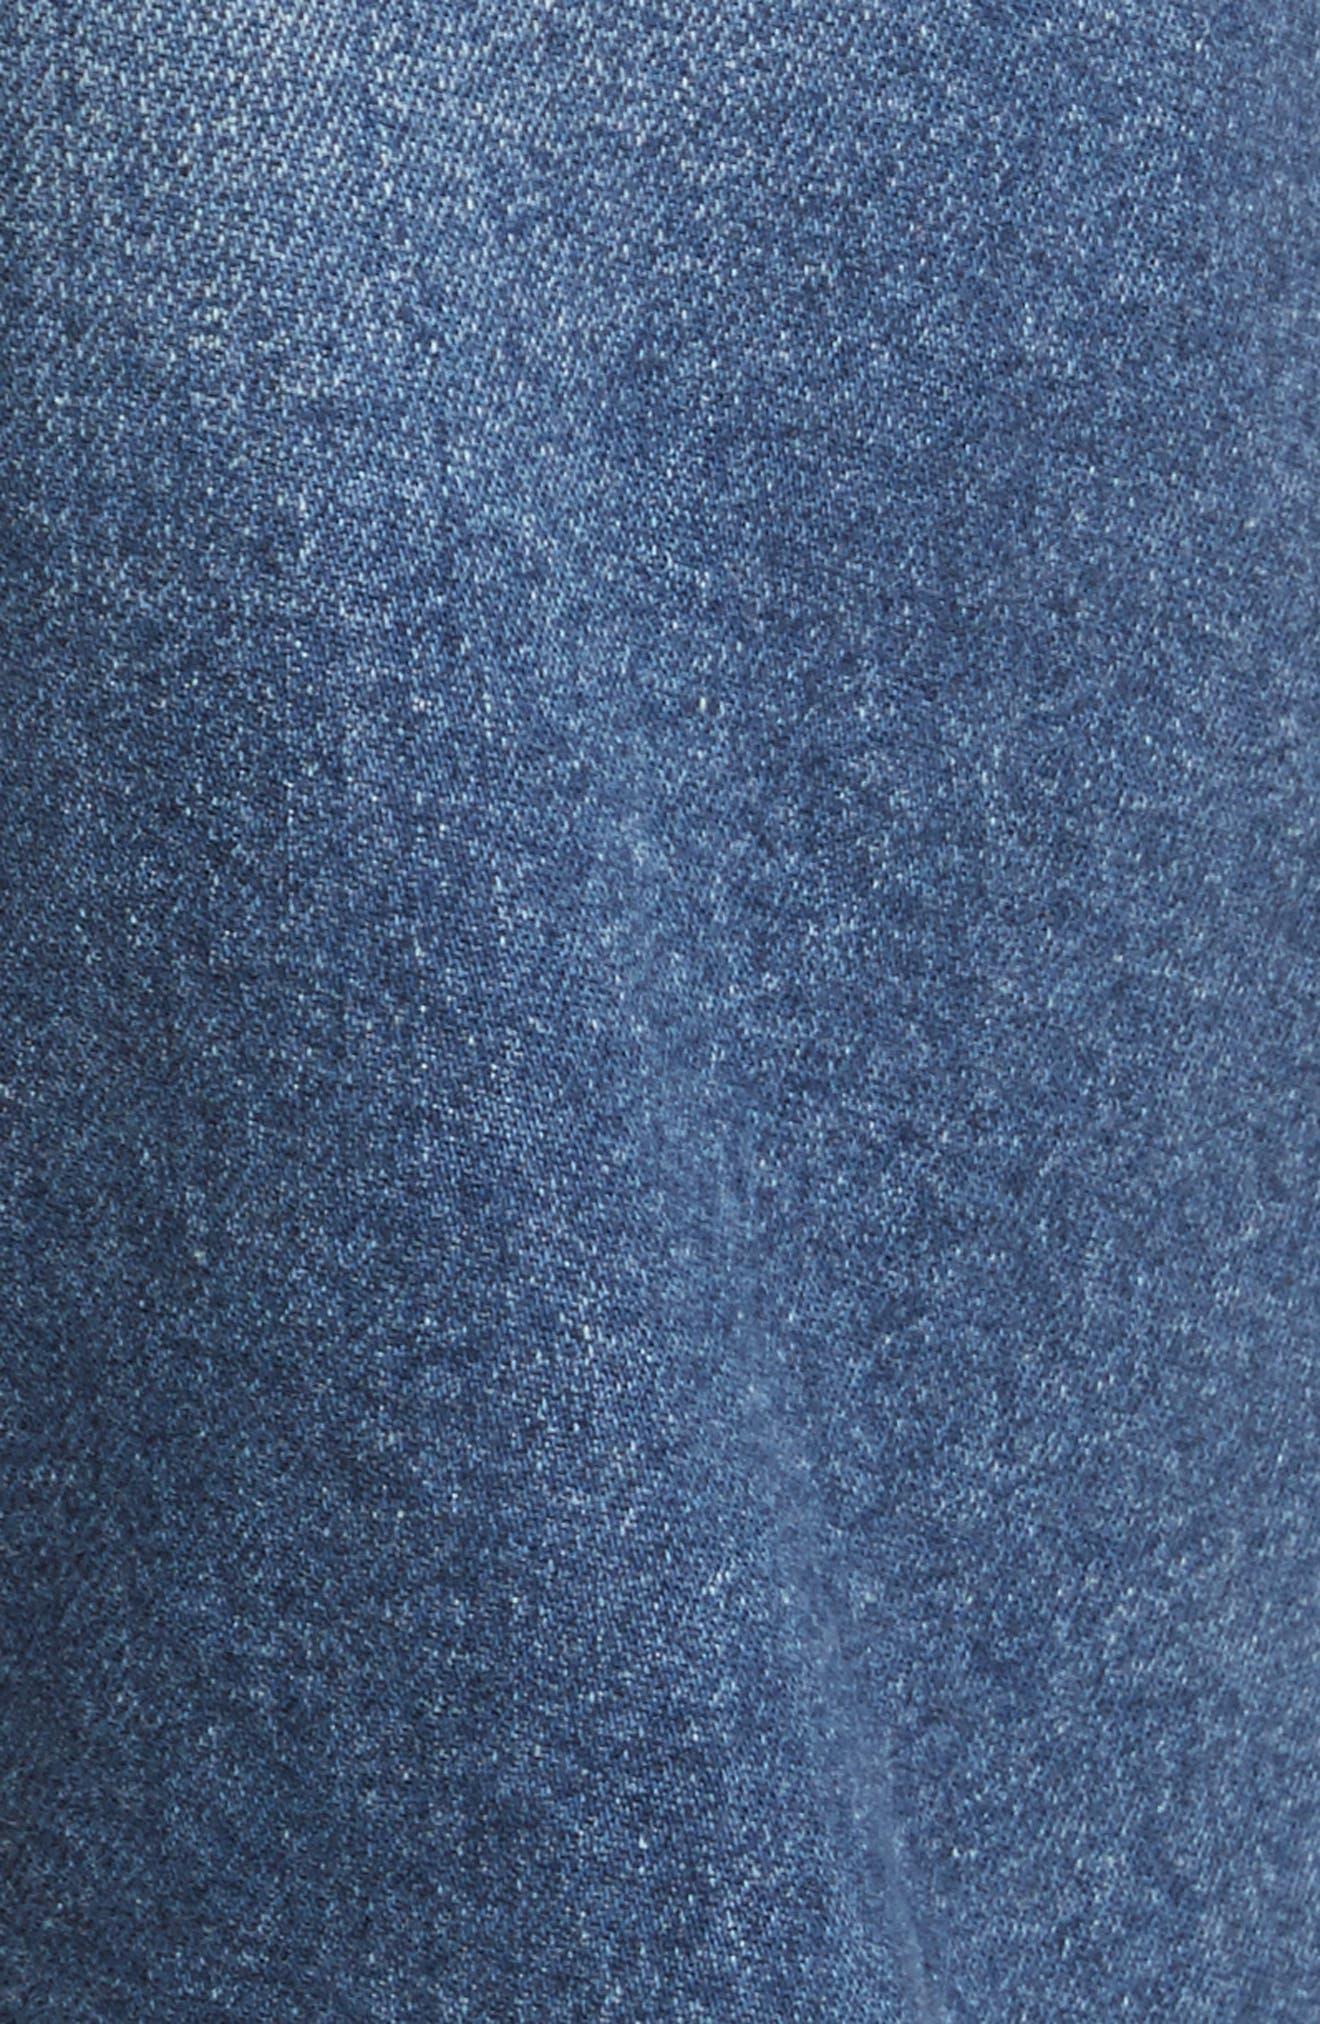 W3 Higher Ground Fringe Crop Straight Leg Jeans,                             Alternate thumbnail 5, color,                             426